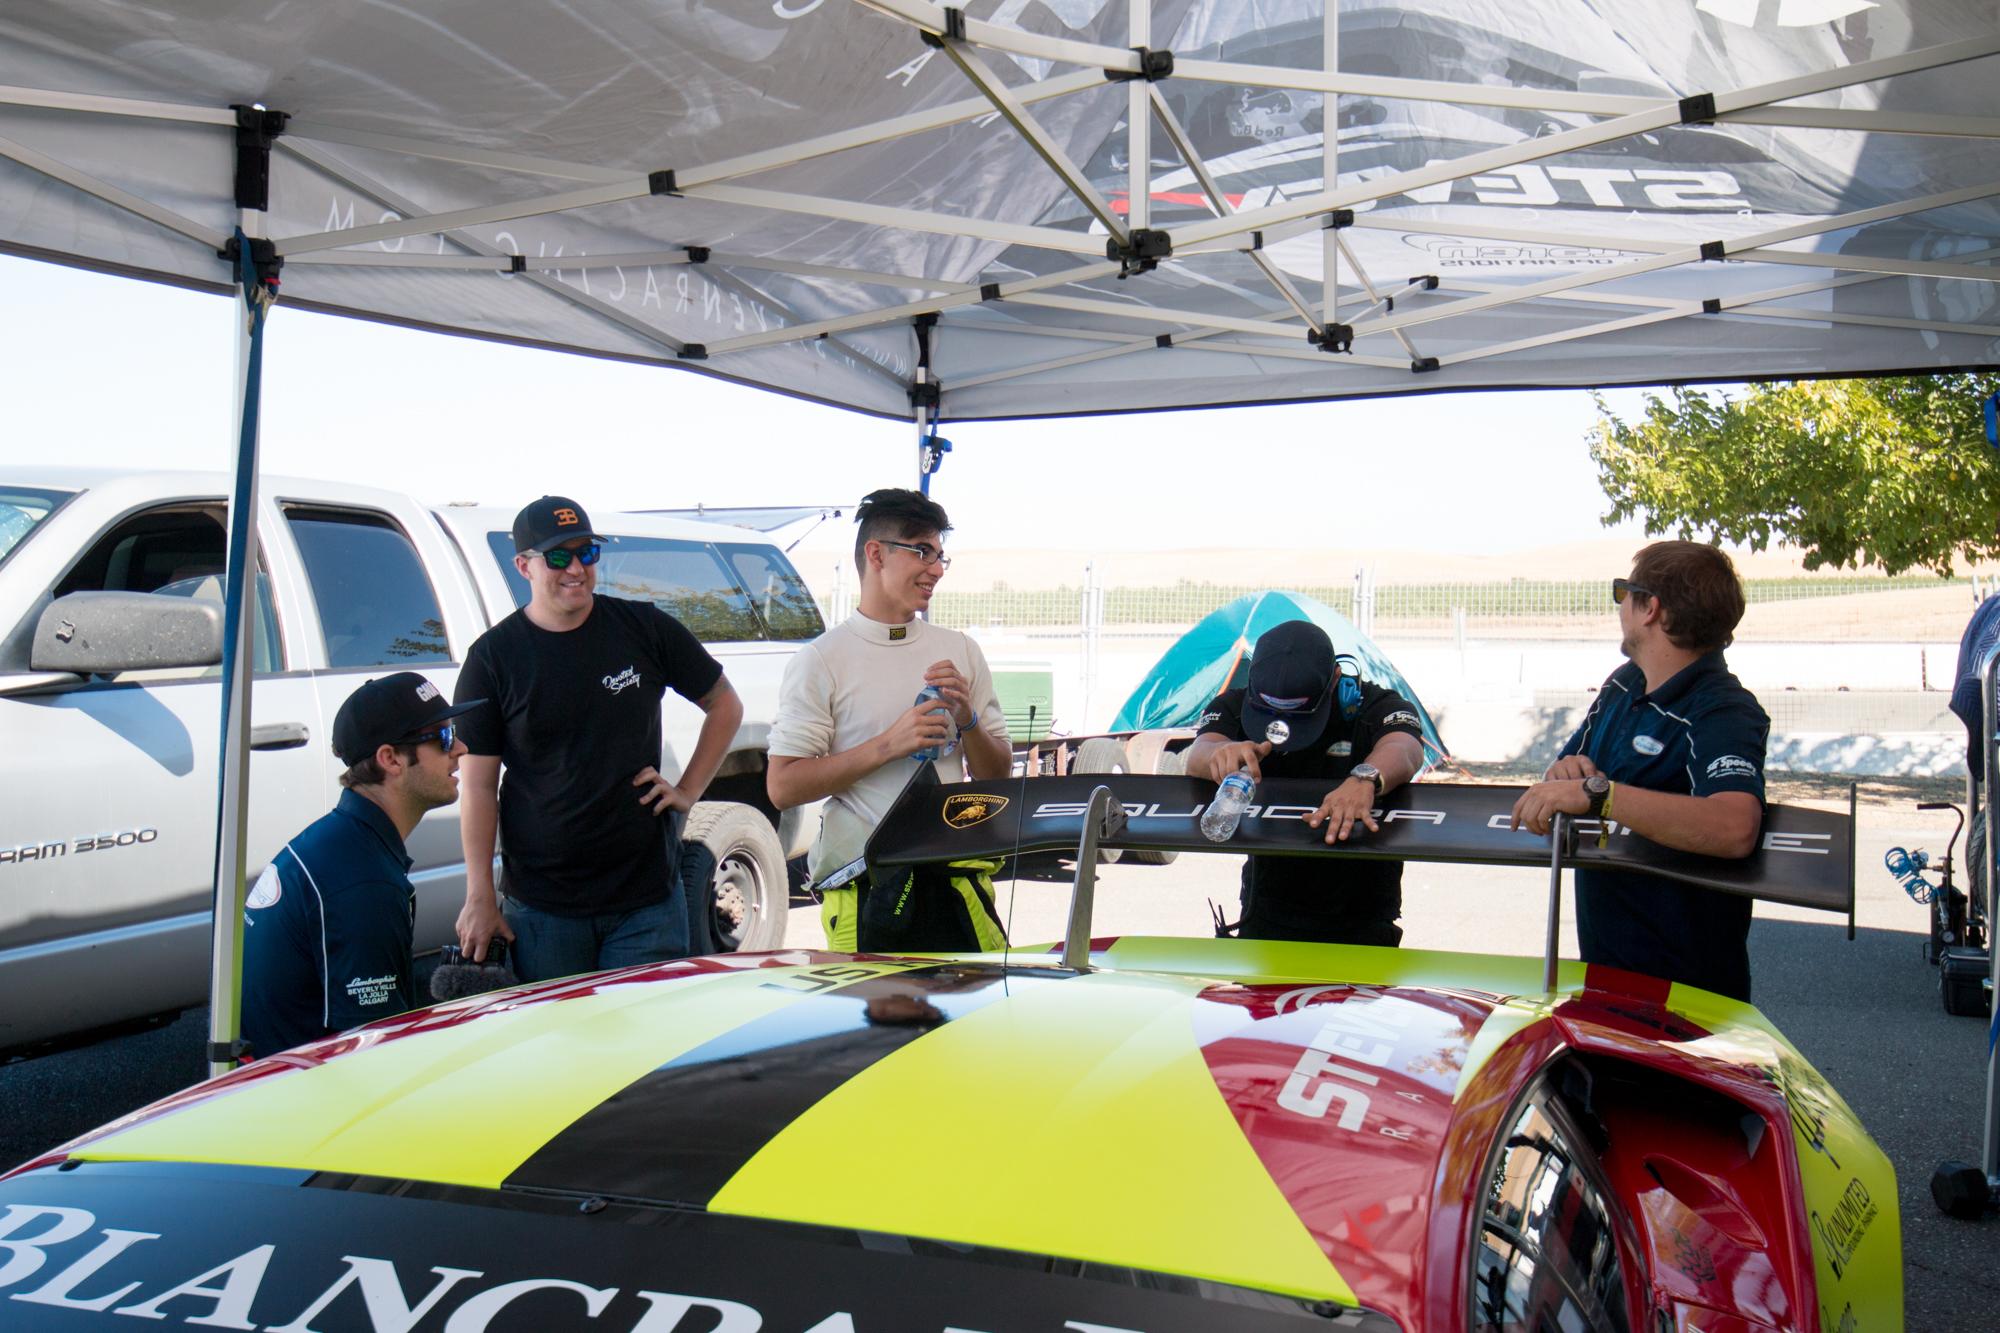 Steven-Racing-20130206-44798.jpg